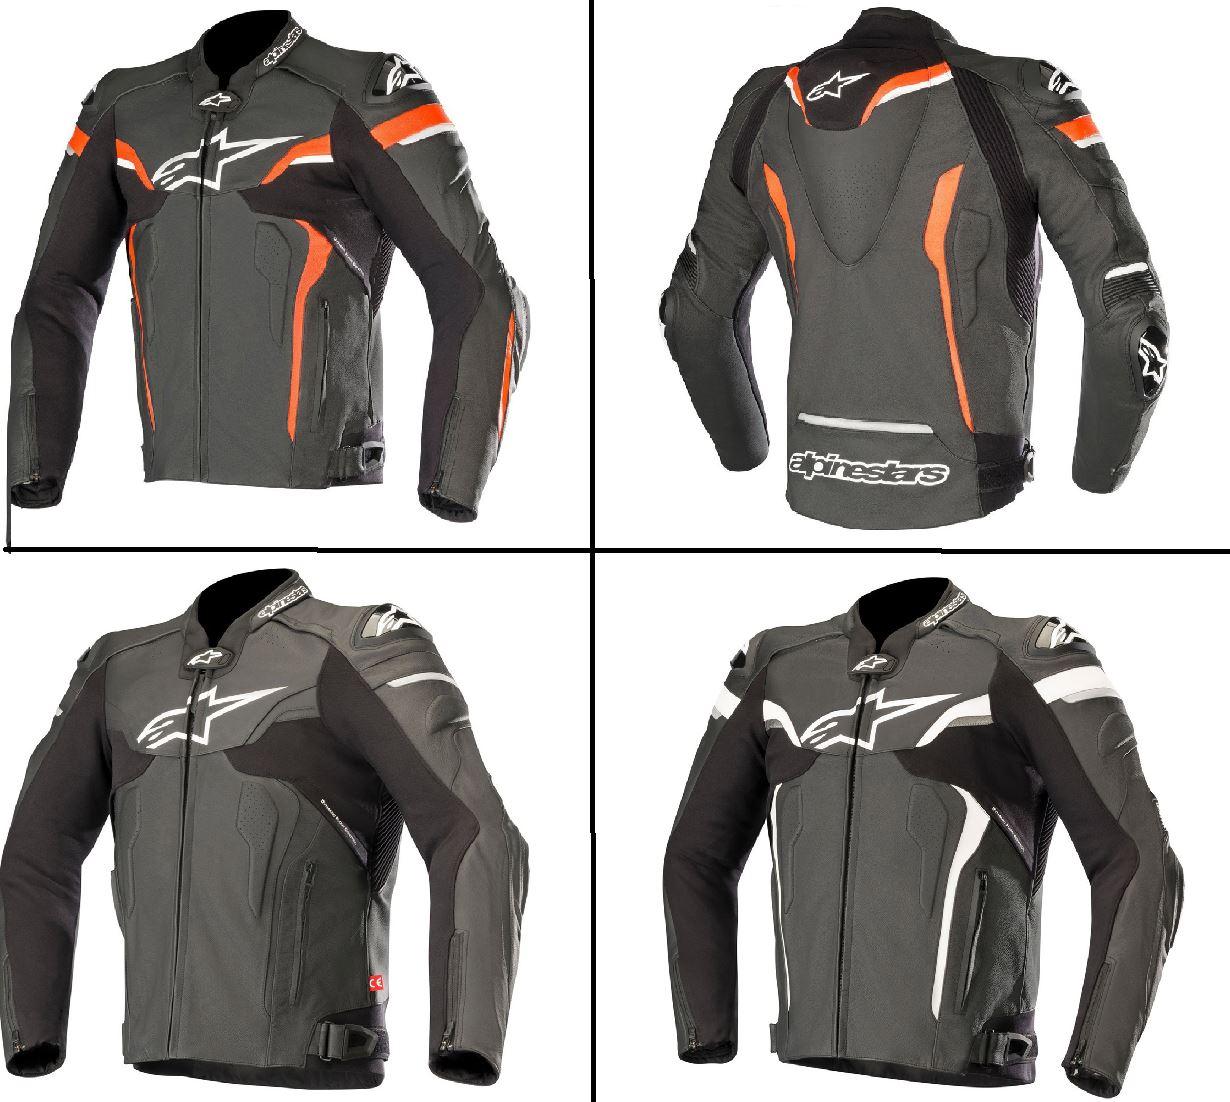 Details about Alpinestars Celer v2 Leather Riding Motorcycle Bike Waterproof Jacket